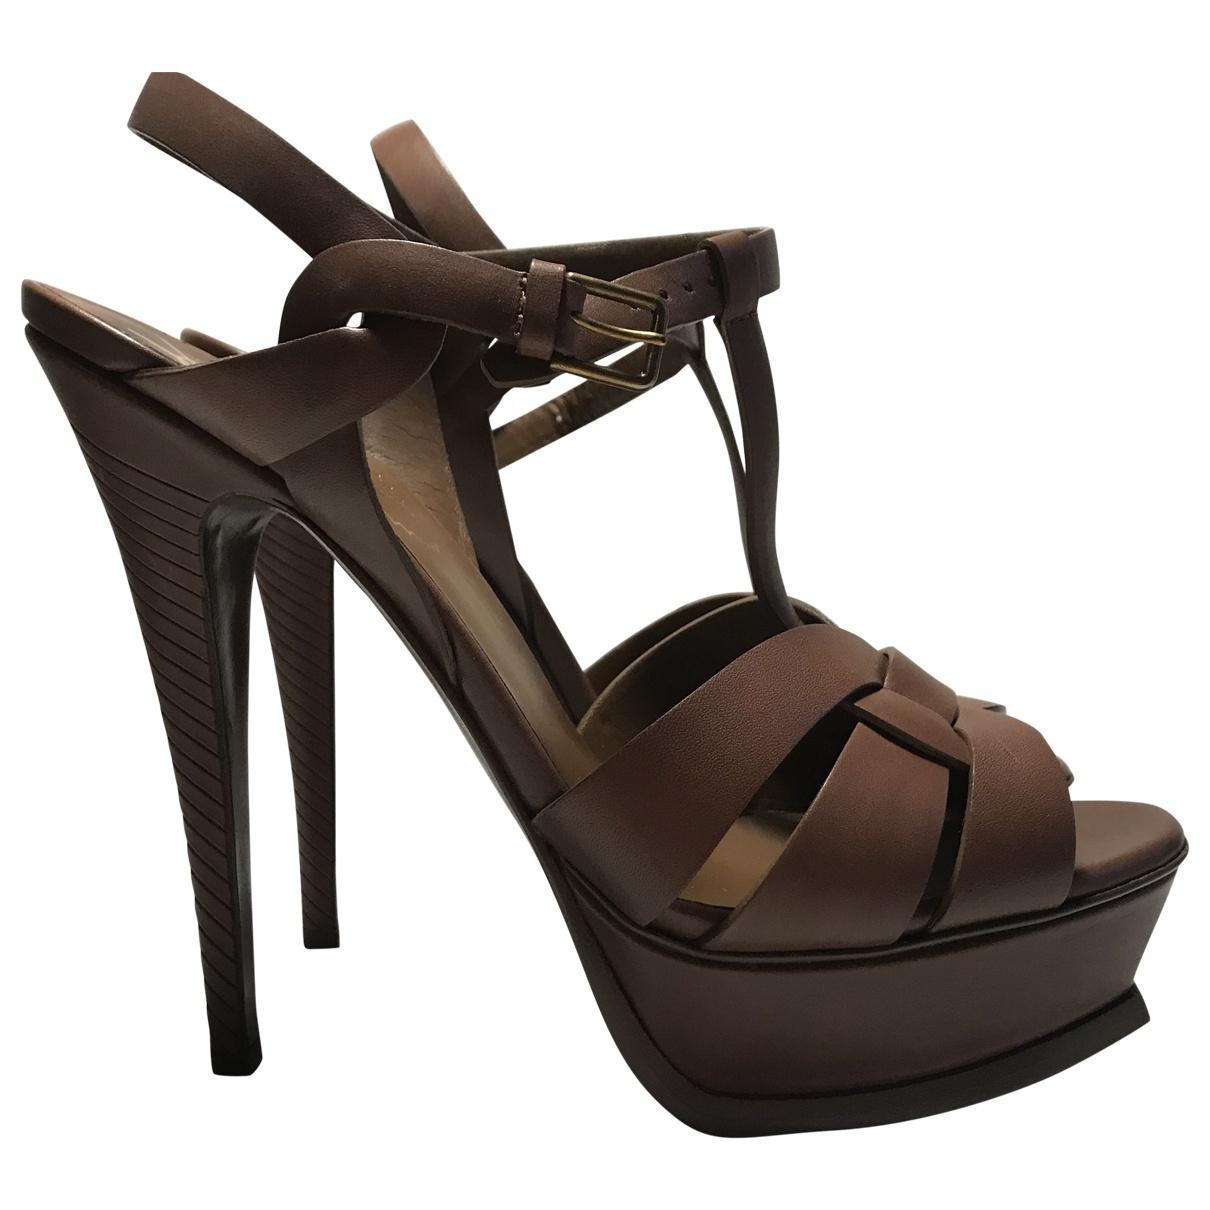 Yves Saint Laurent Tribute Brown Leather Sandals for Women 39 EU